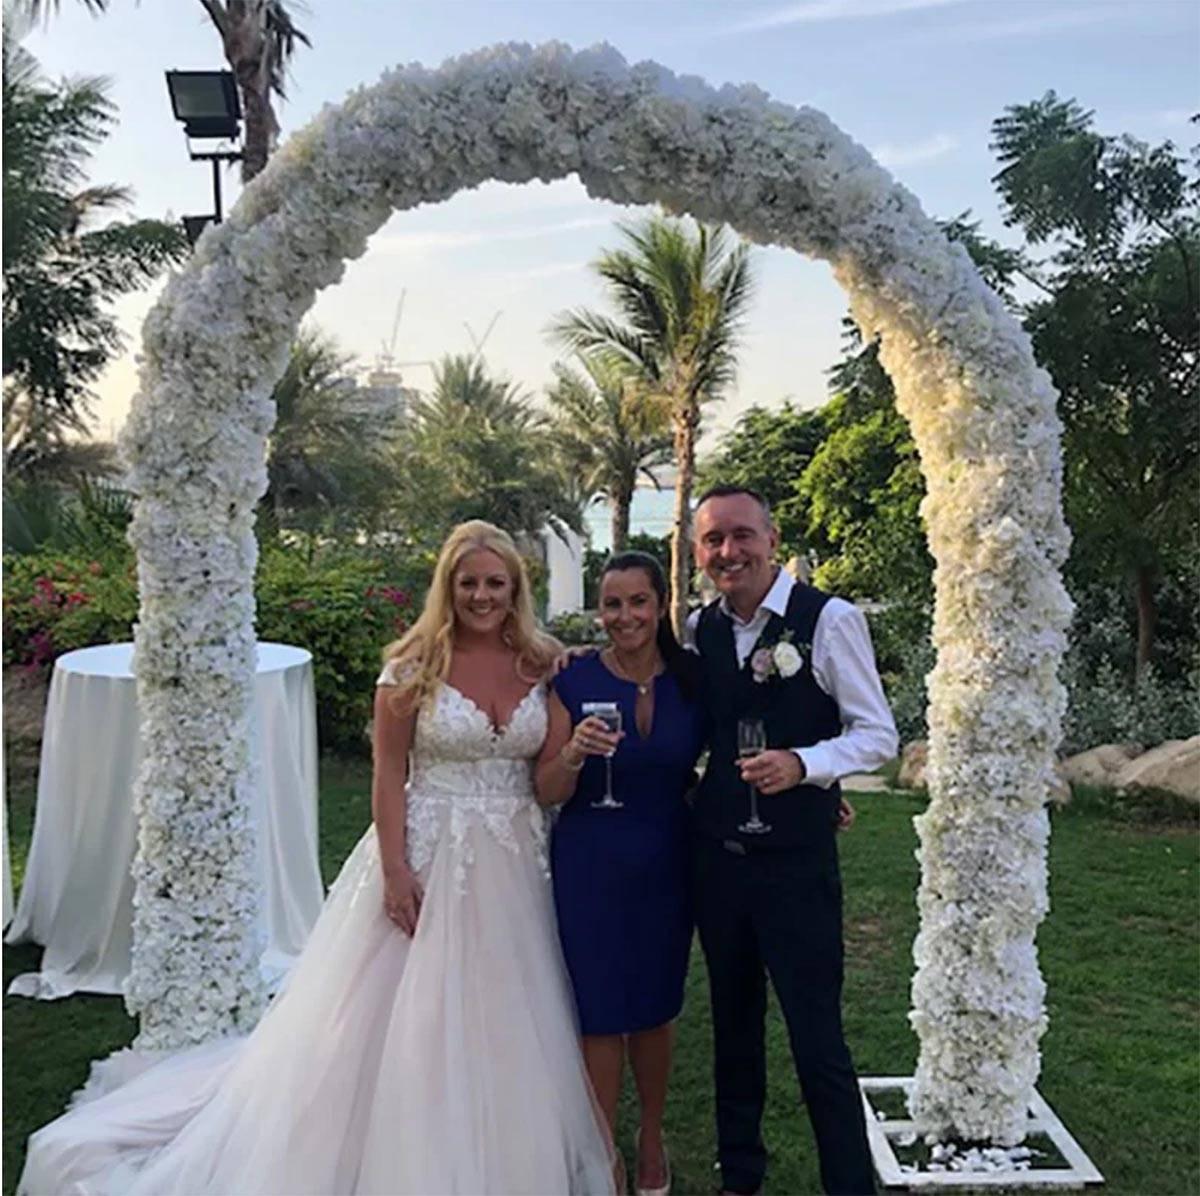 Wedding celebrant Jenny with Bride and Groom